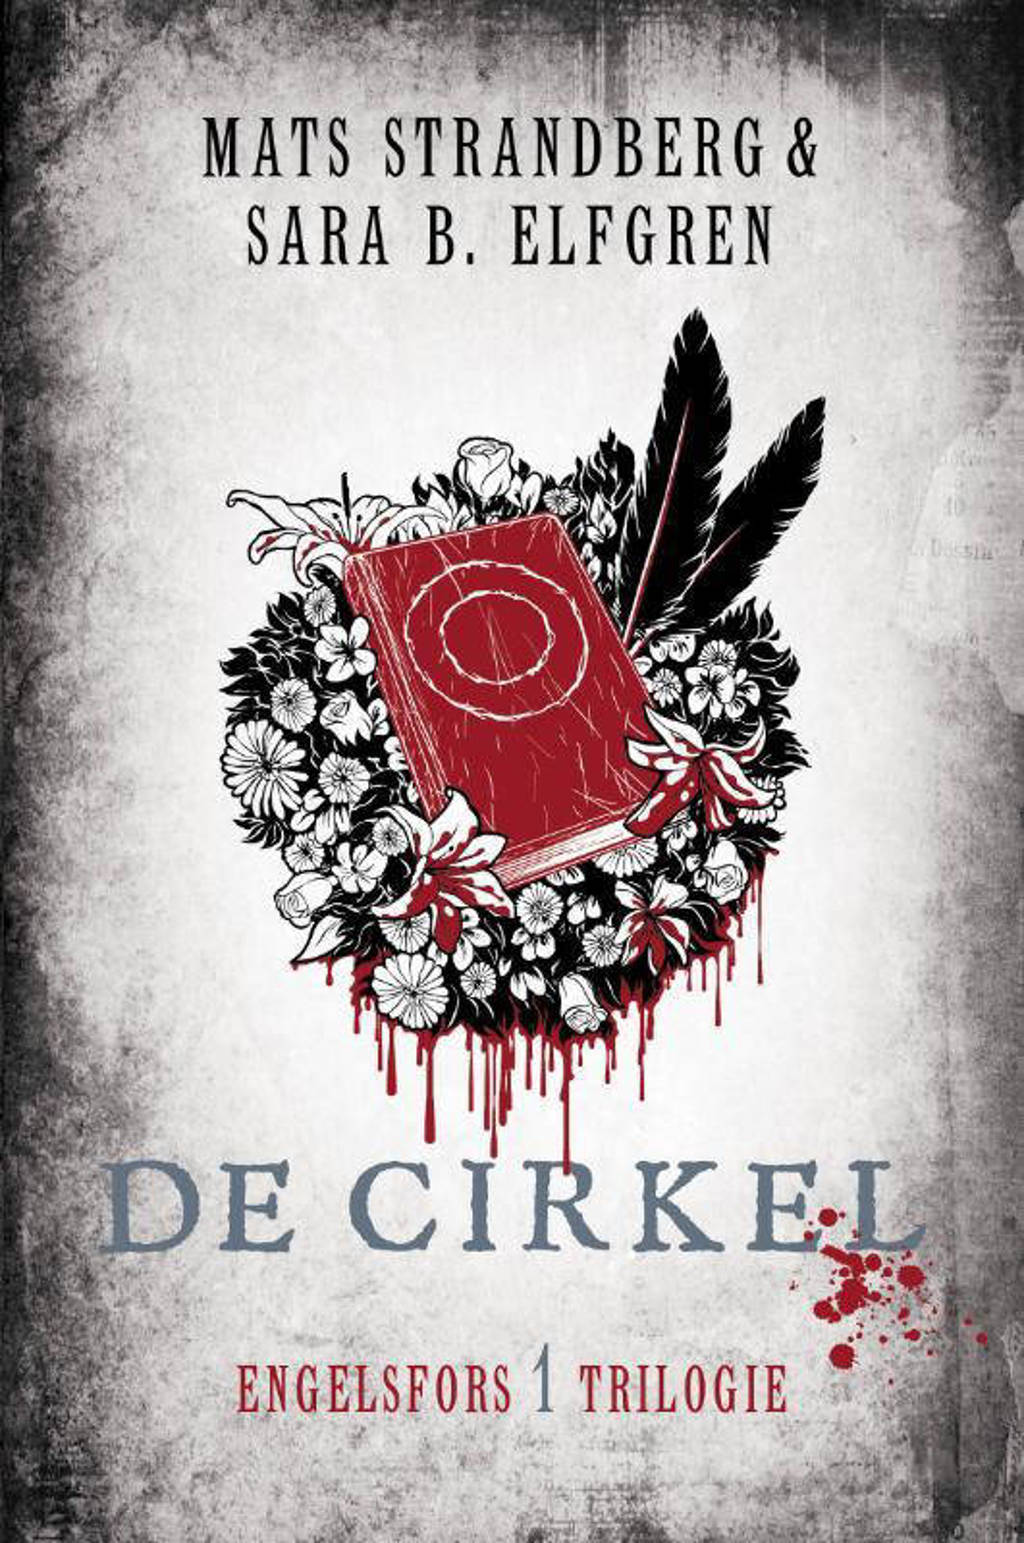 Engelsfors-trilogie: De cirkel - Mats Strandberg en Sarah B. Elfgren